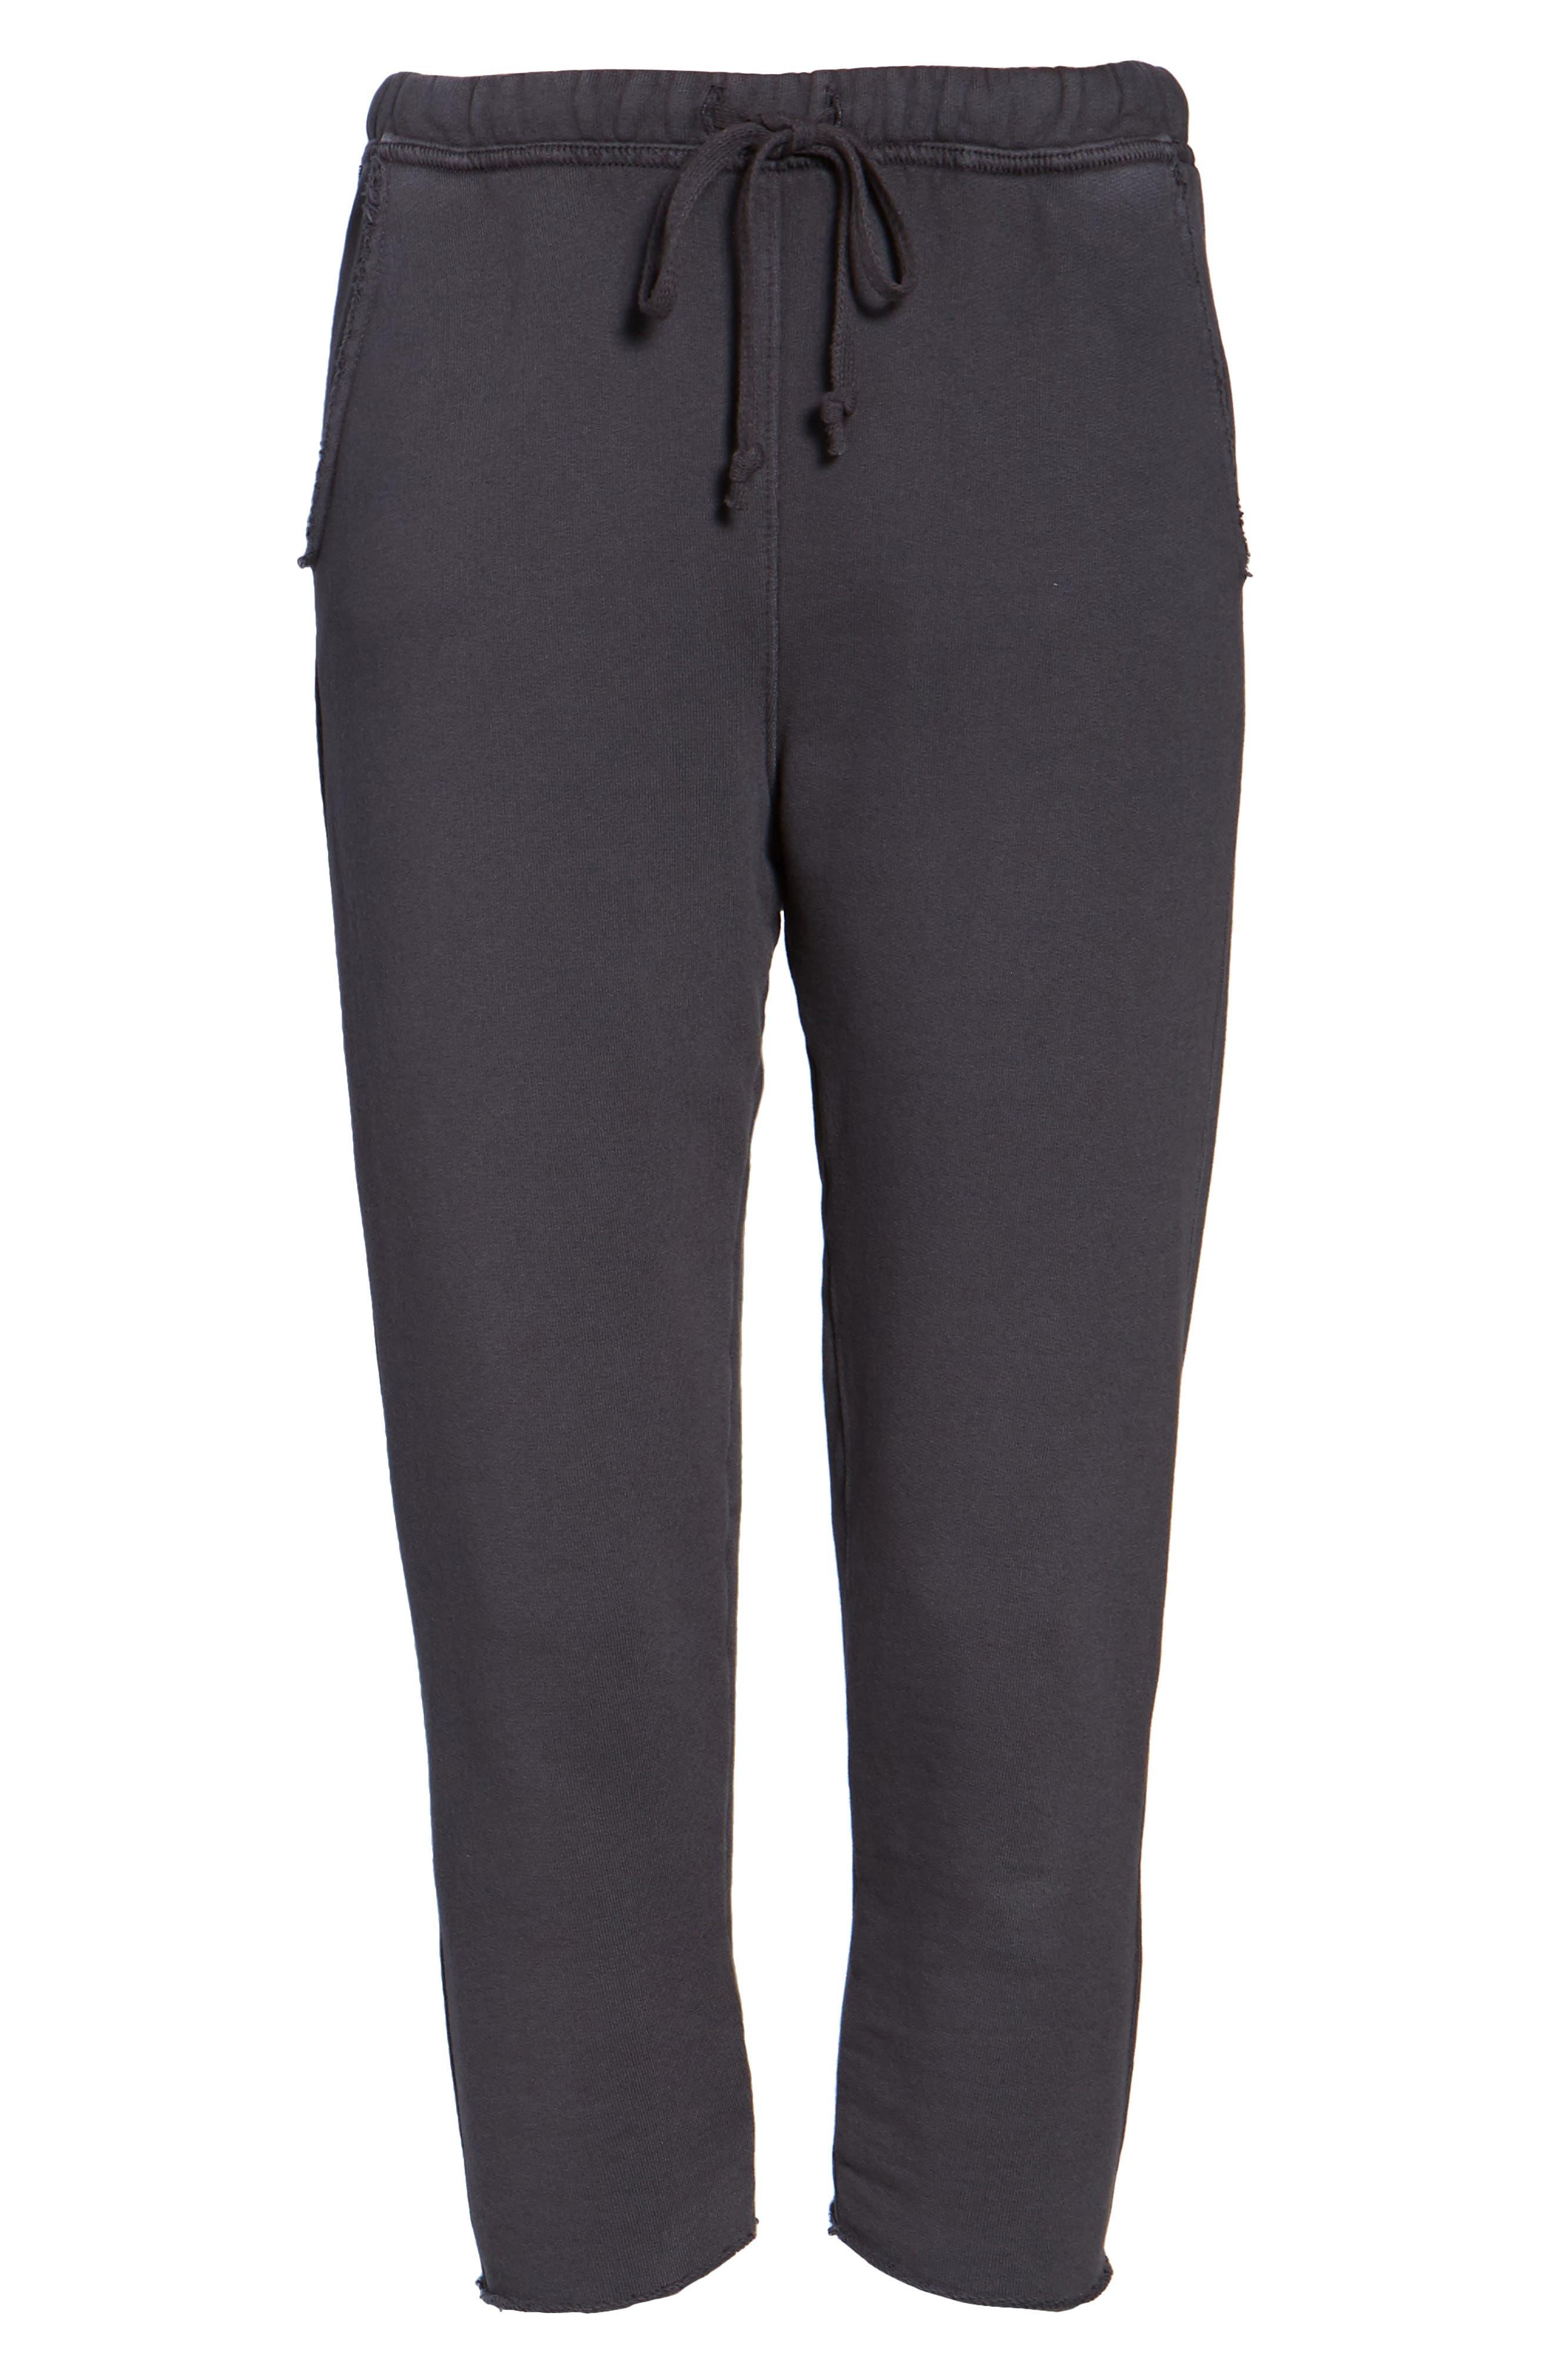 Raw Hem Crop Sweatpants,                             Alternate thumbnail 6, color,                             010